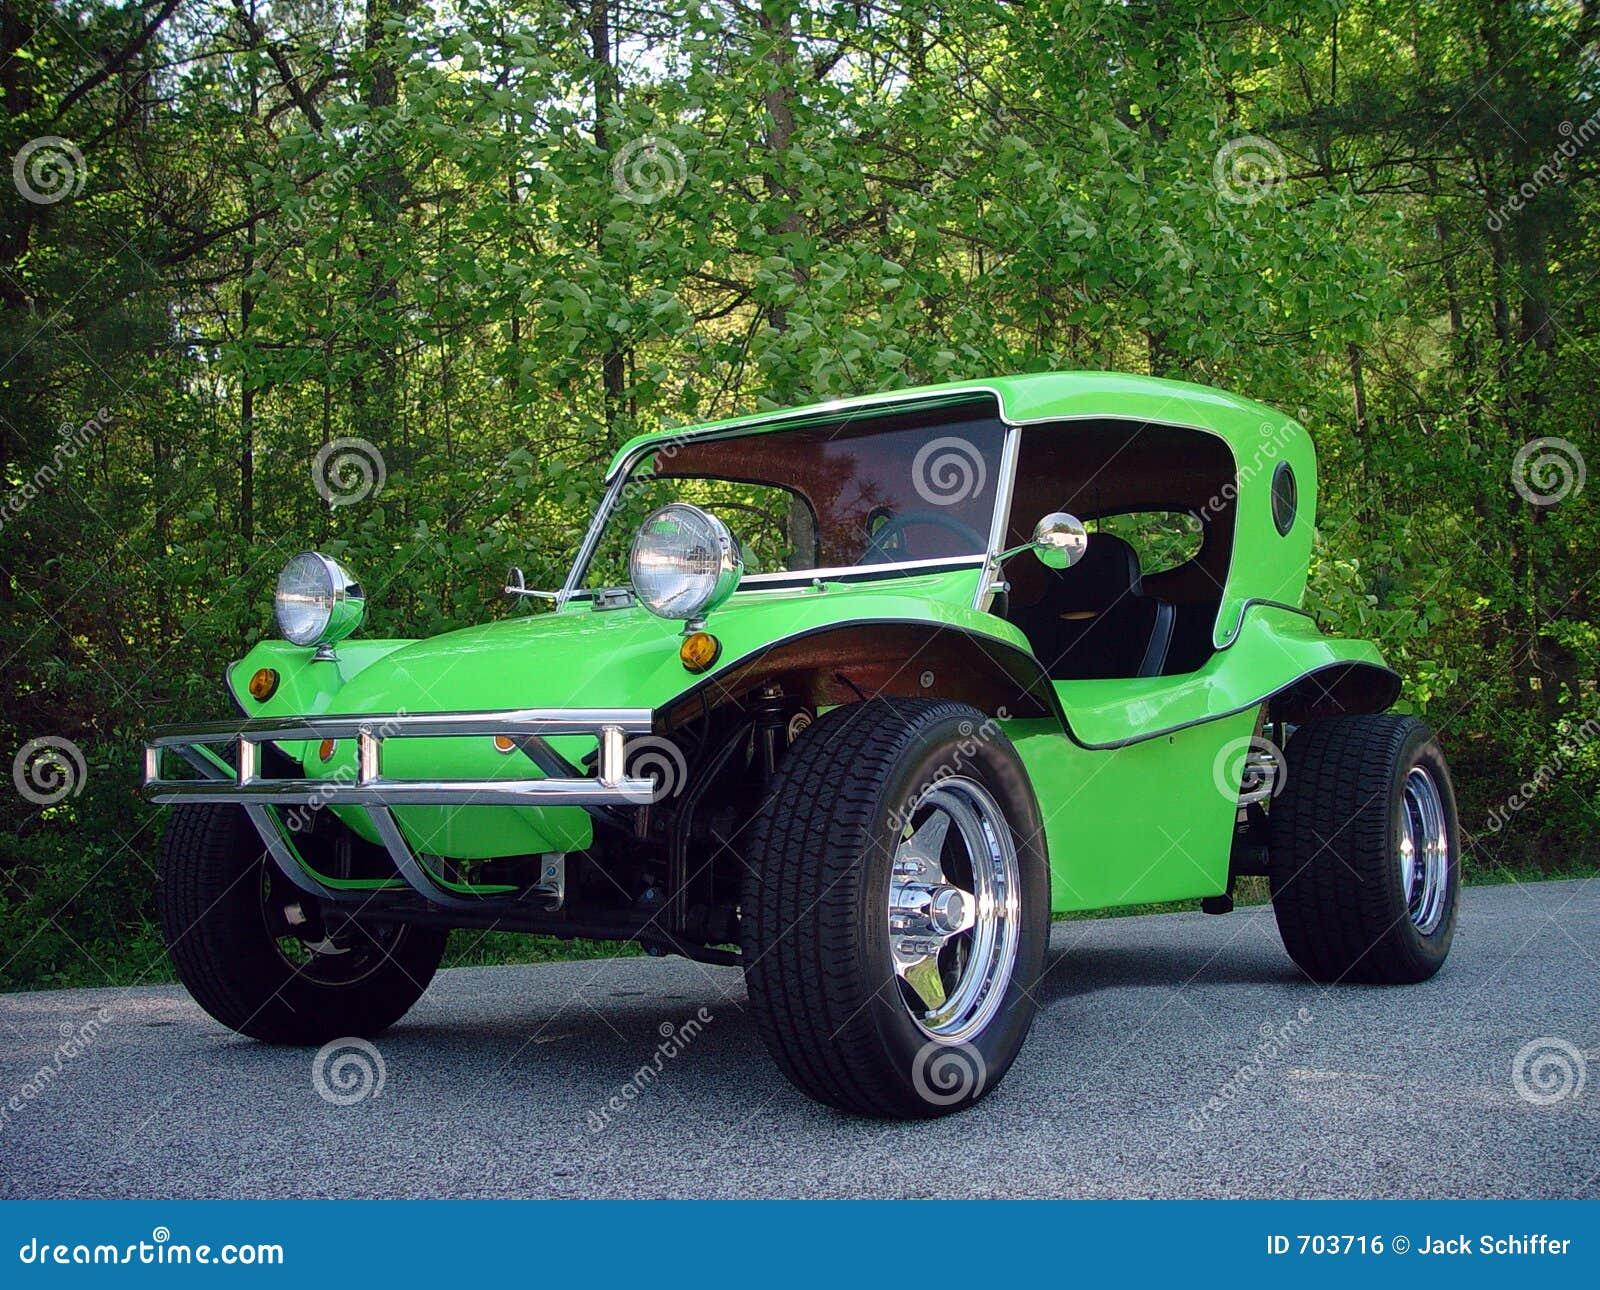 Volkswagen Dune Buggy >> Hotrod Dune Buggy stock photo. Image of buggy, ride, vehicle - 703716